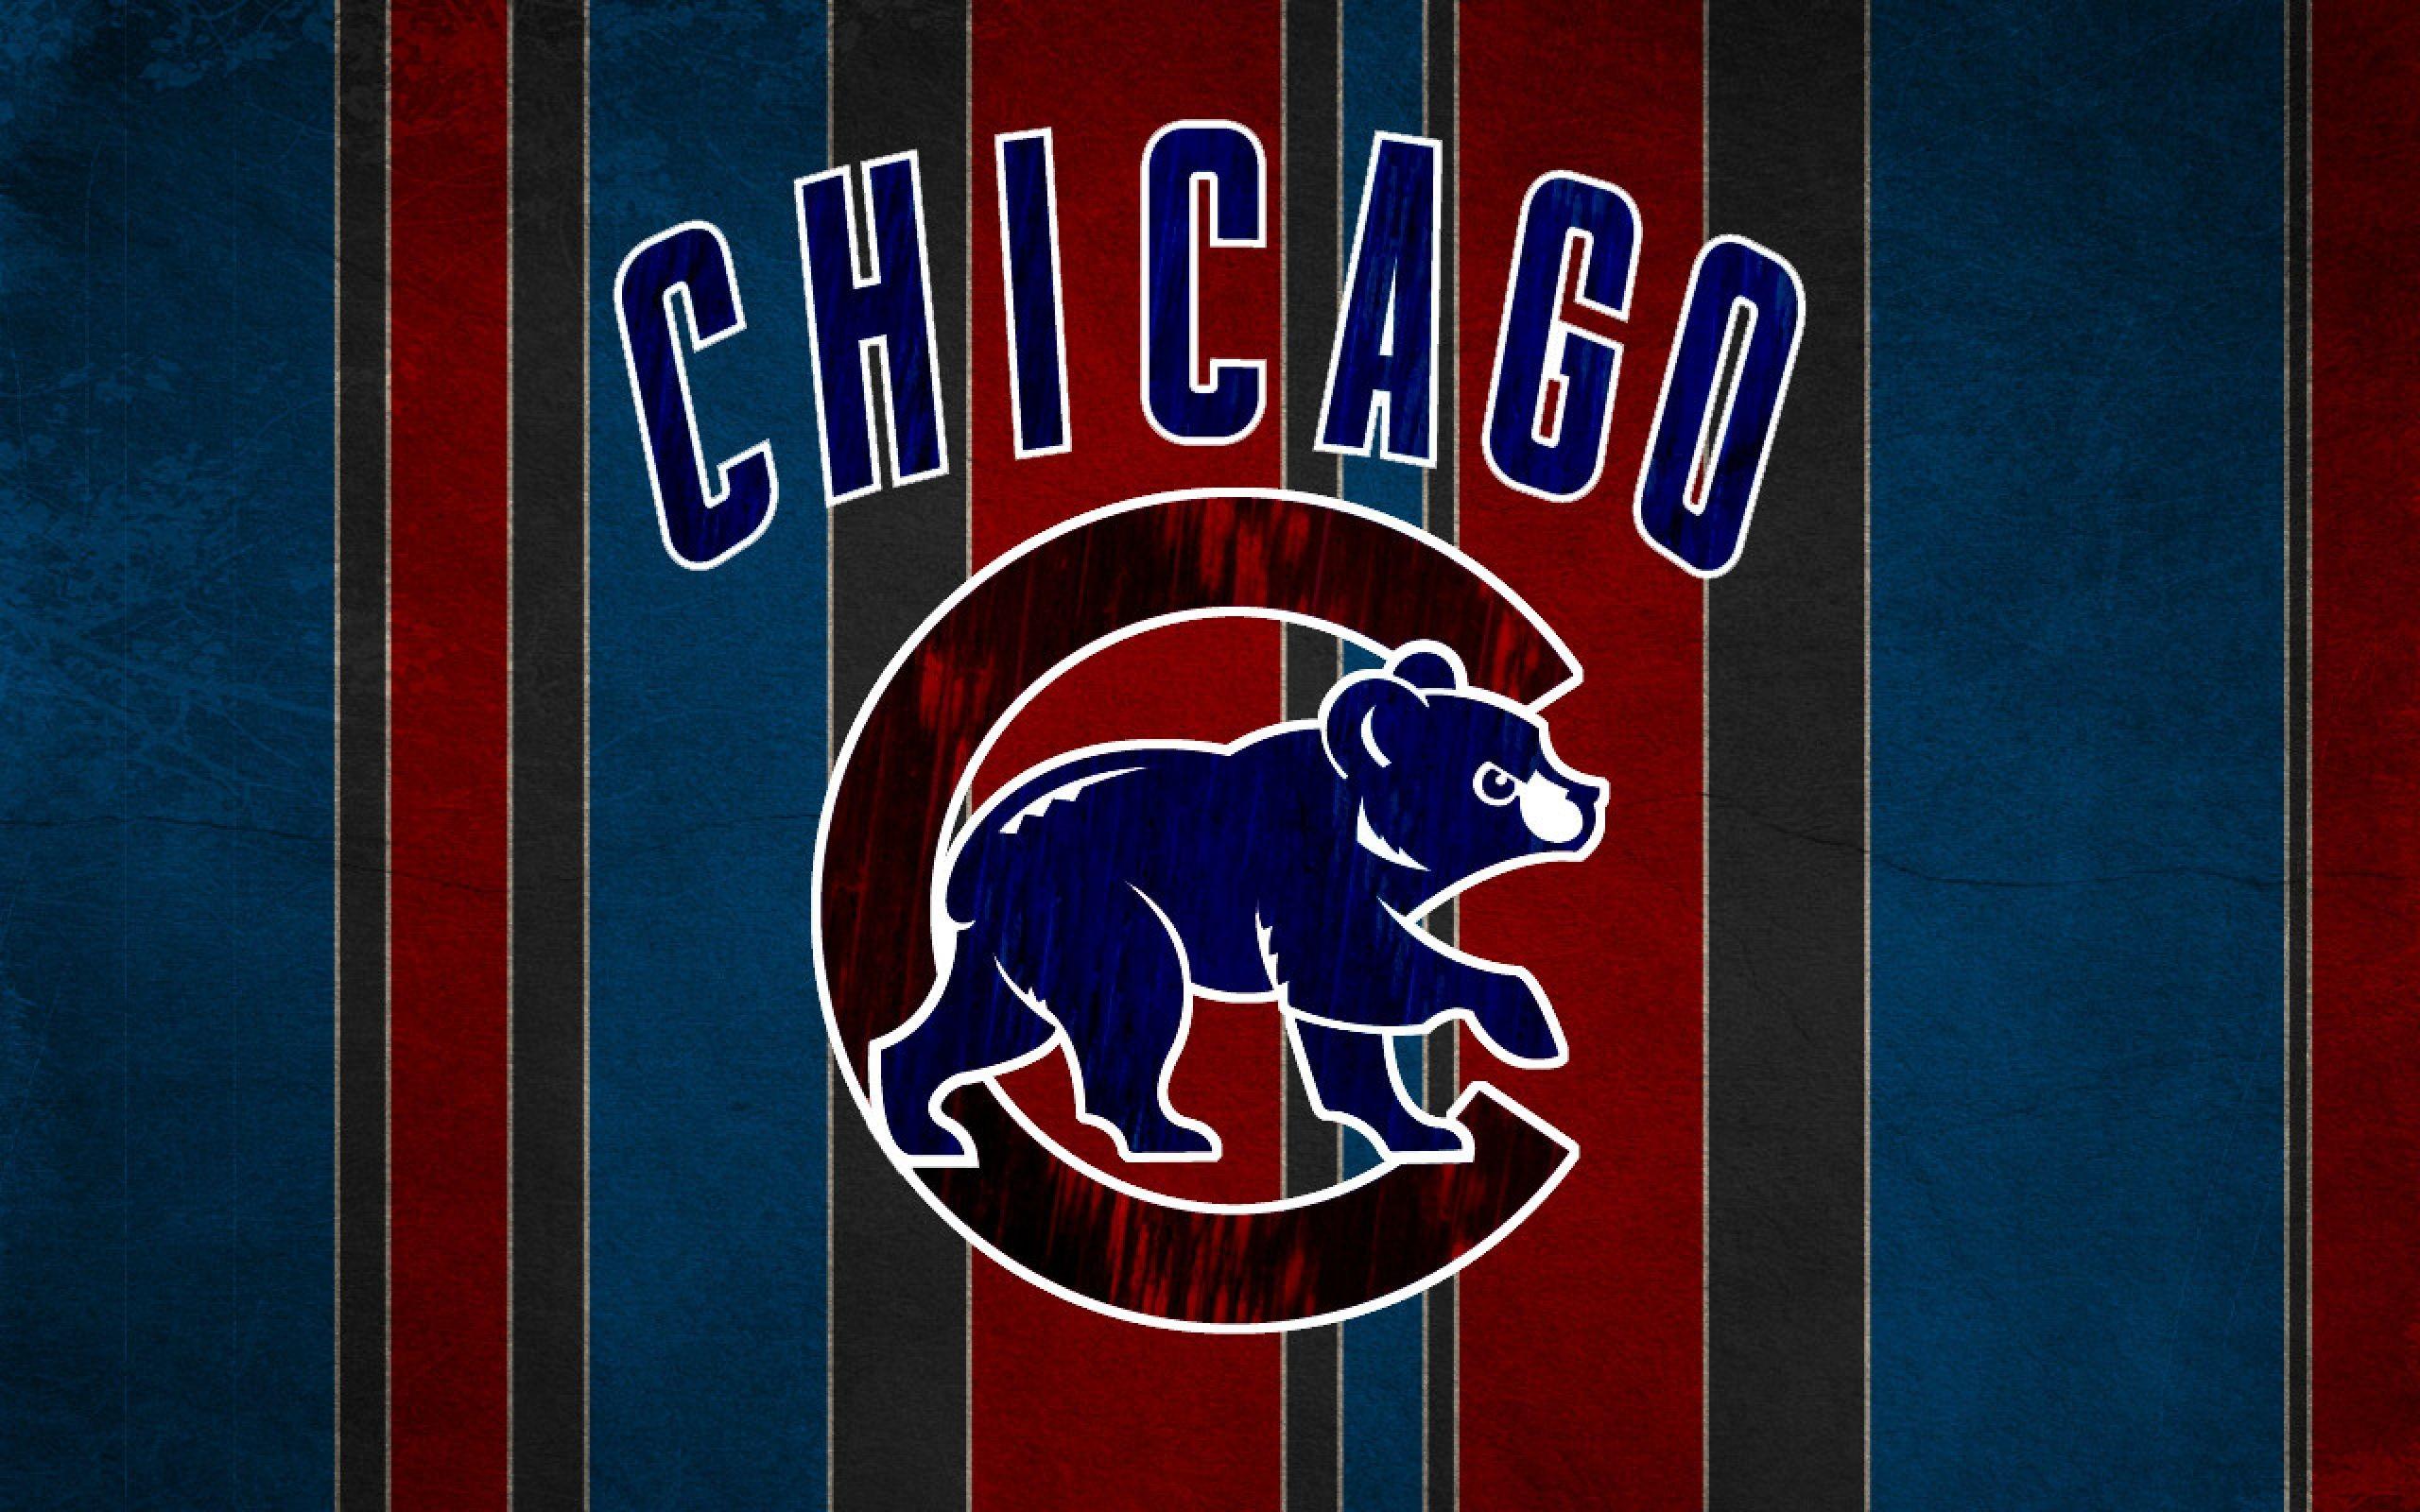 CHICAGO CUBS mlb baseball (58) wallpaper background